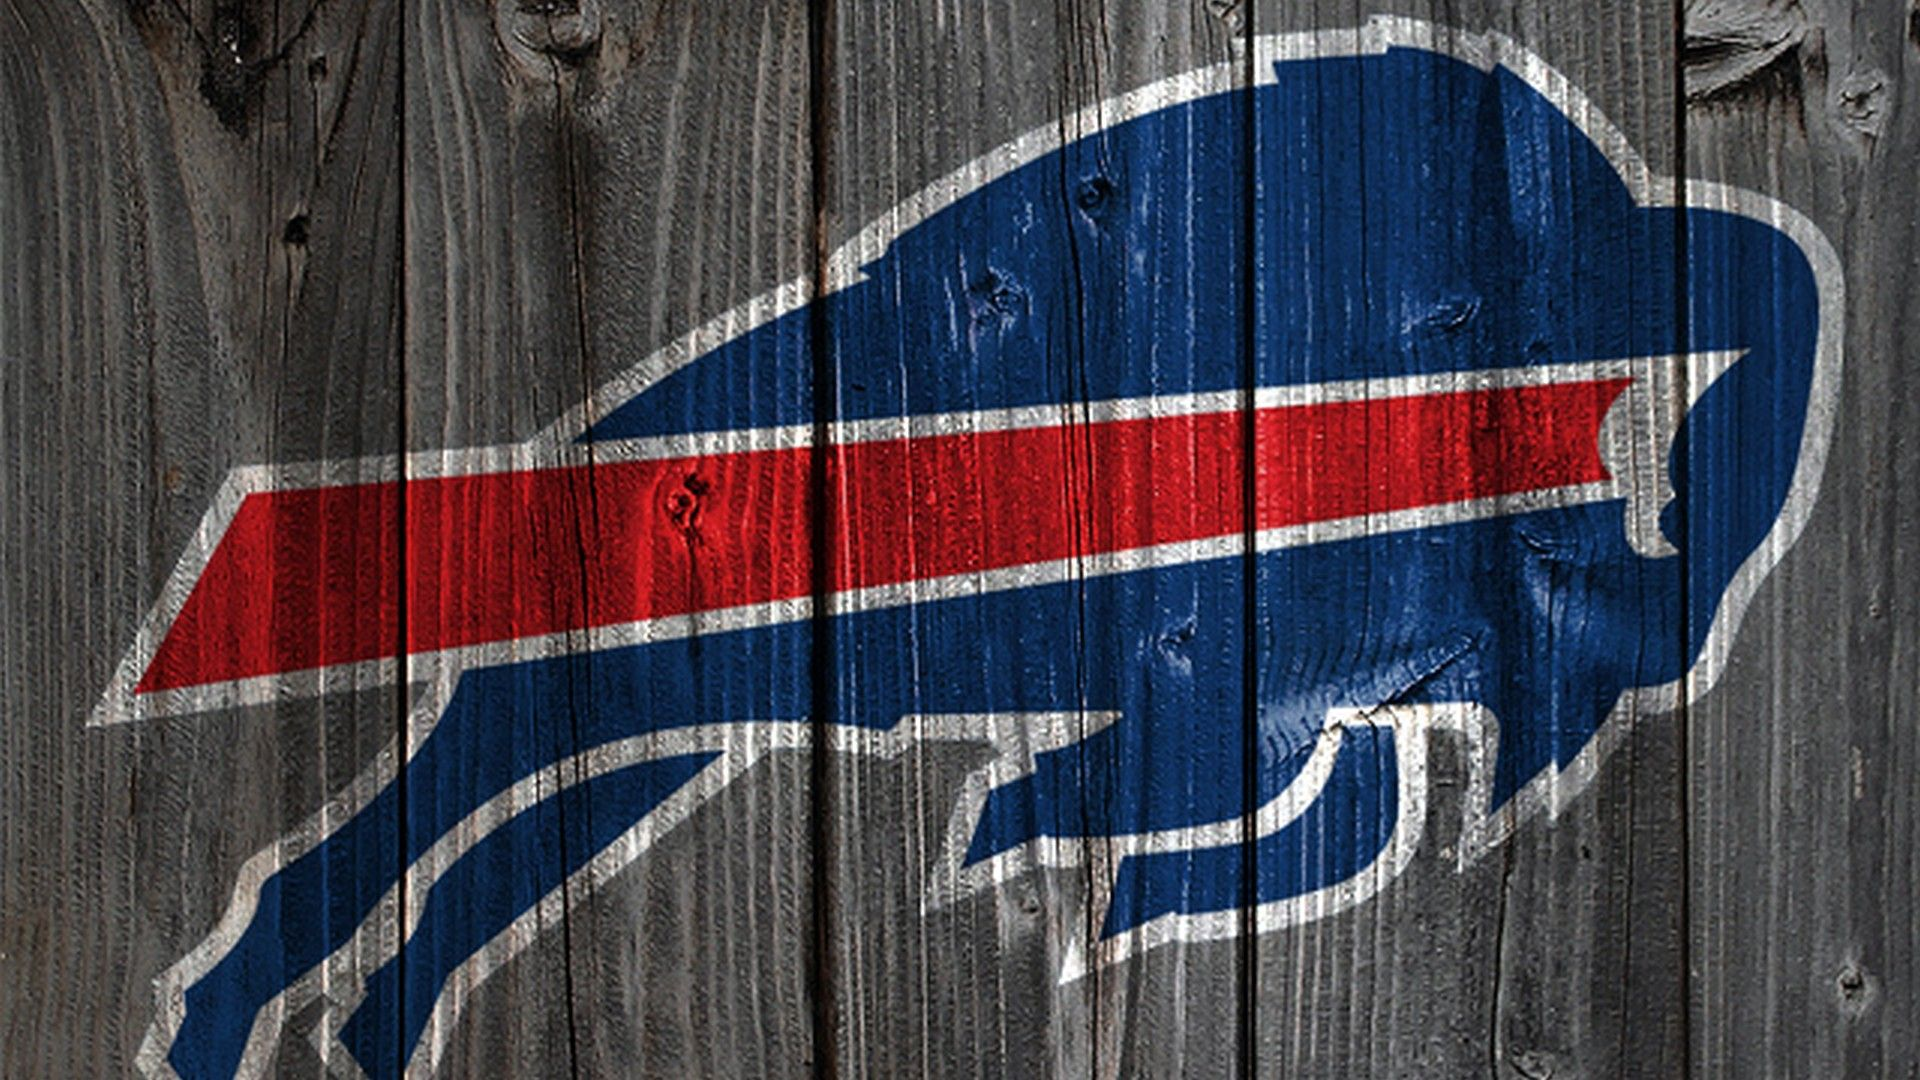 Buffalo Bills Wallpaper 2021 Nfl Football Wallpapers Buffalo Bills Nfl Football Wallpaper Buffalo Bills Stuff